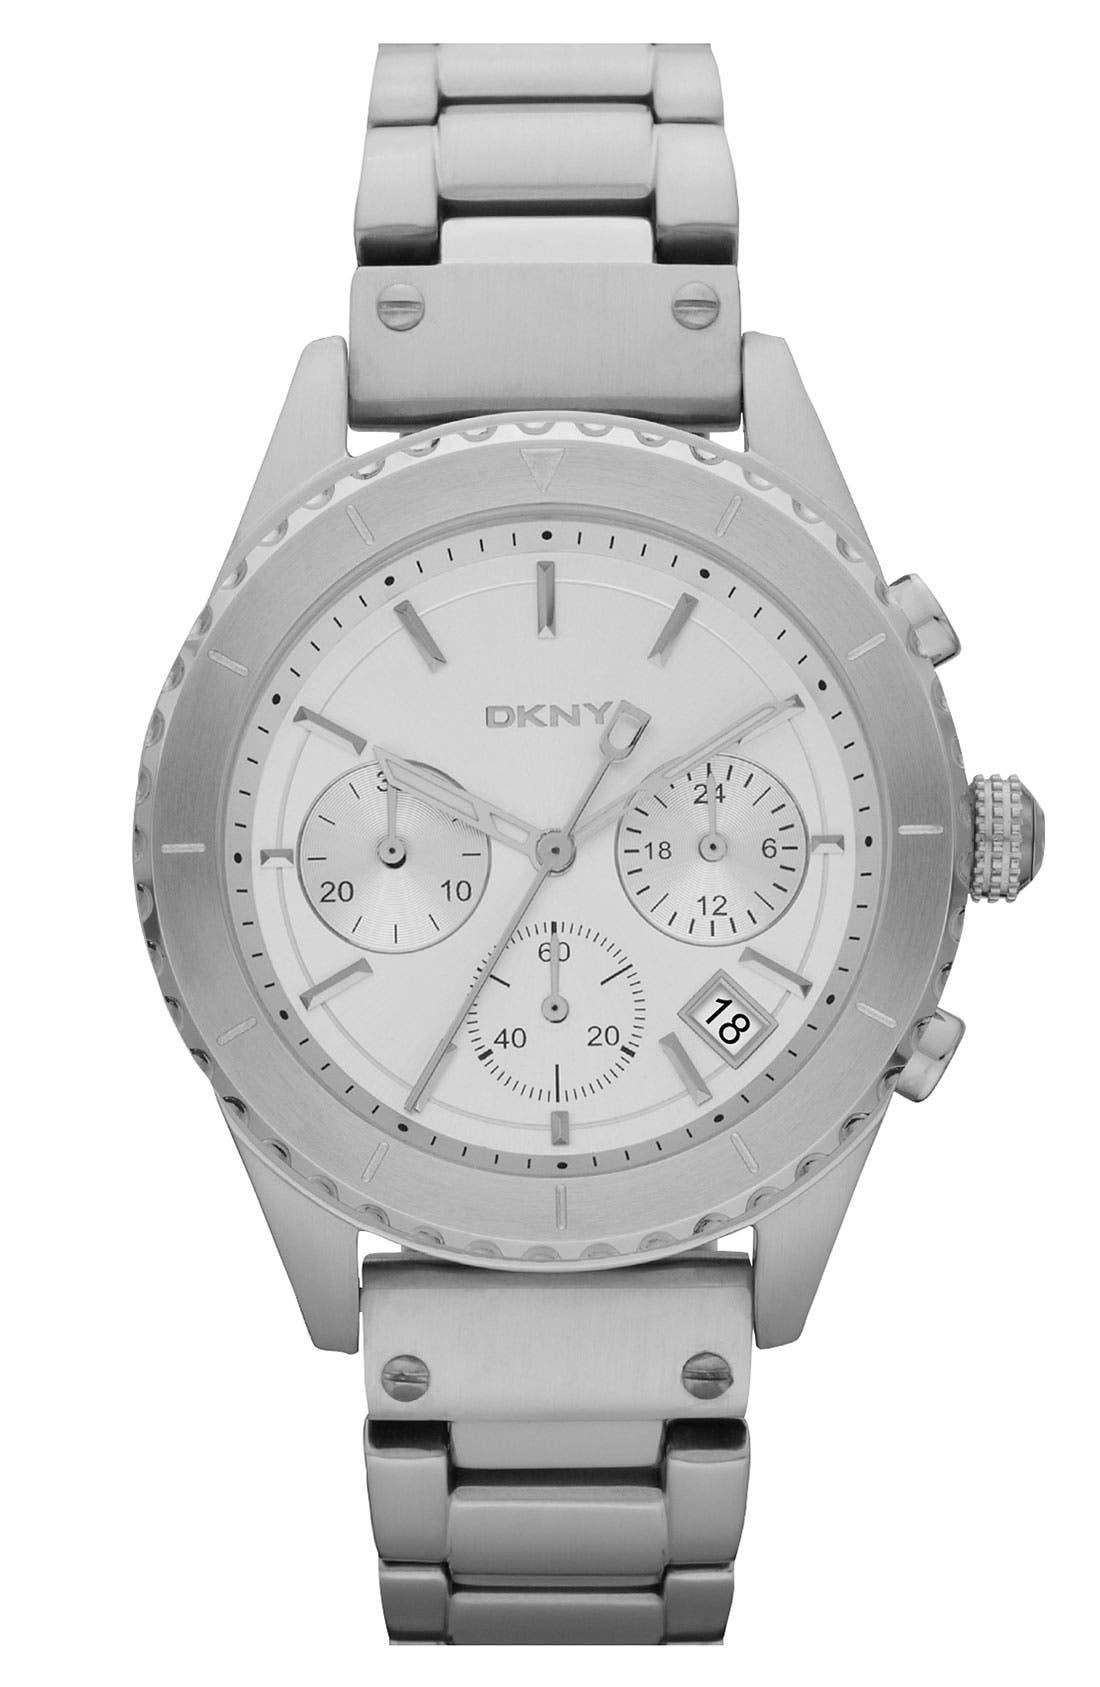 Alternate Image 1 Selected - DKNY 'Street Smart' Chronograph Notched Bezel Watch